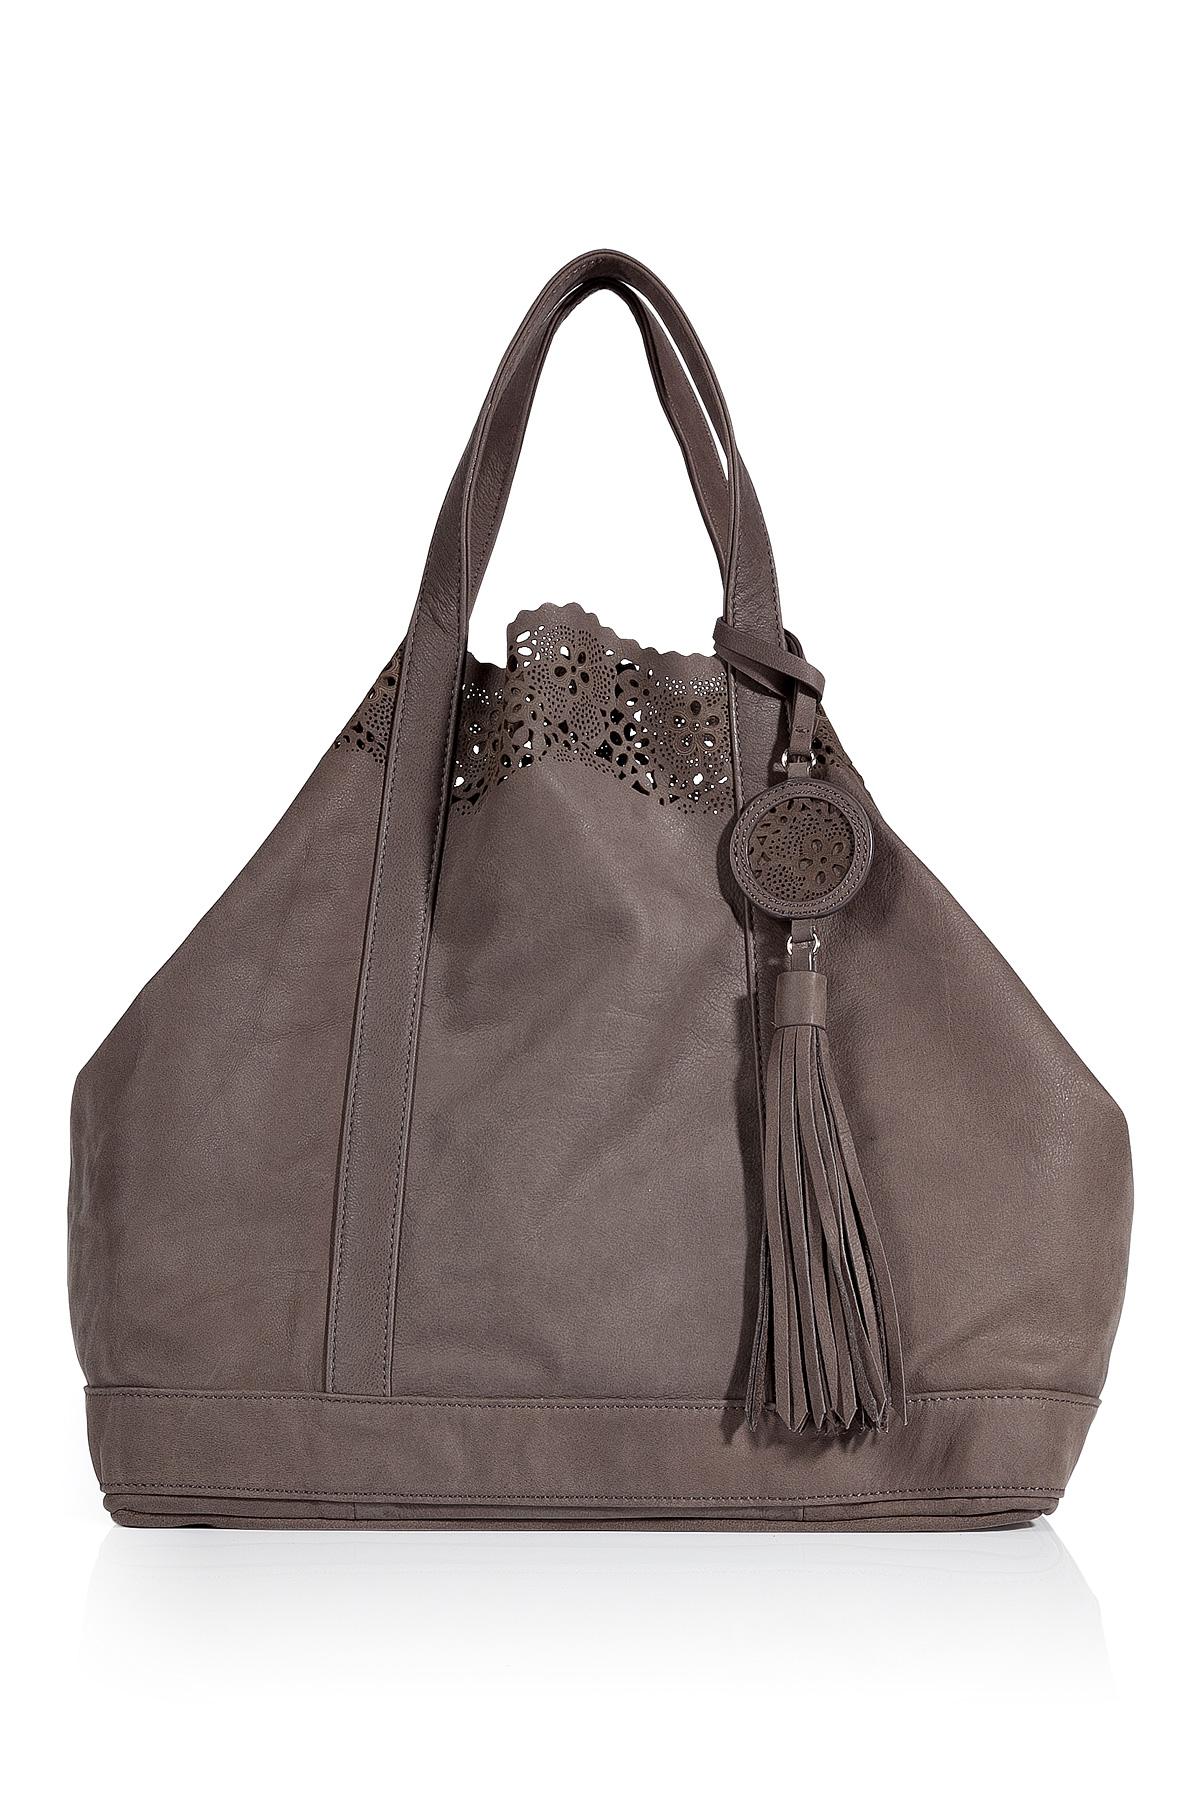 vanessa bruno taupe leather large cabas bag in brown taupe lyst. Black Bedroom Furniture Sets. Home Design Ideas